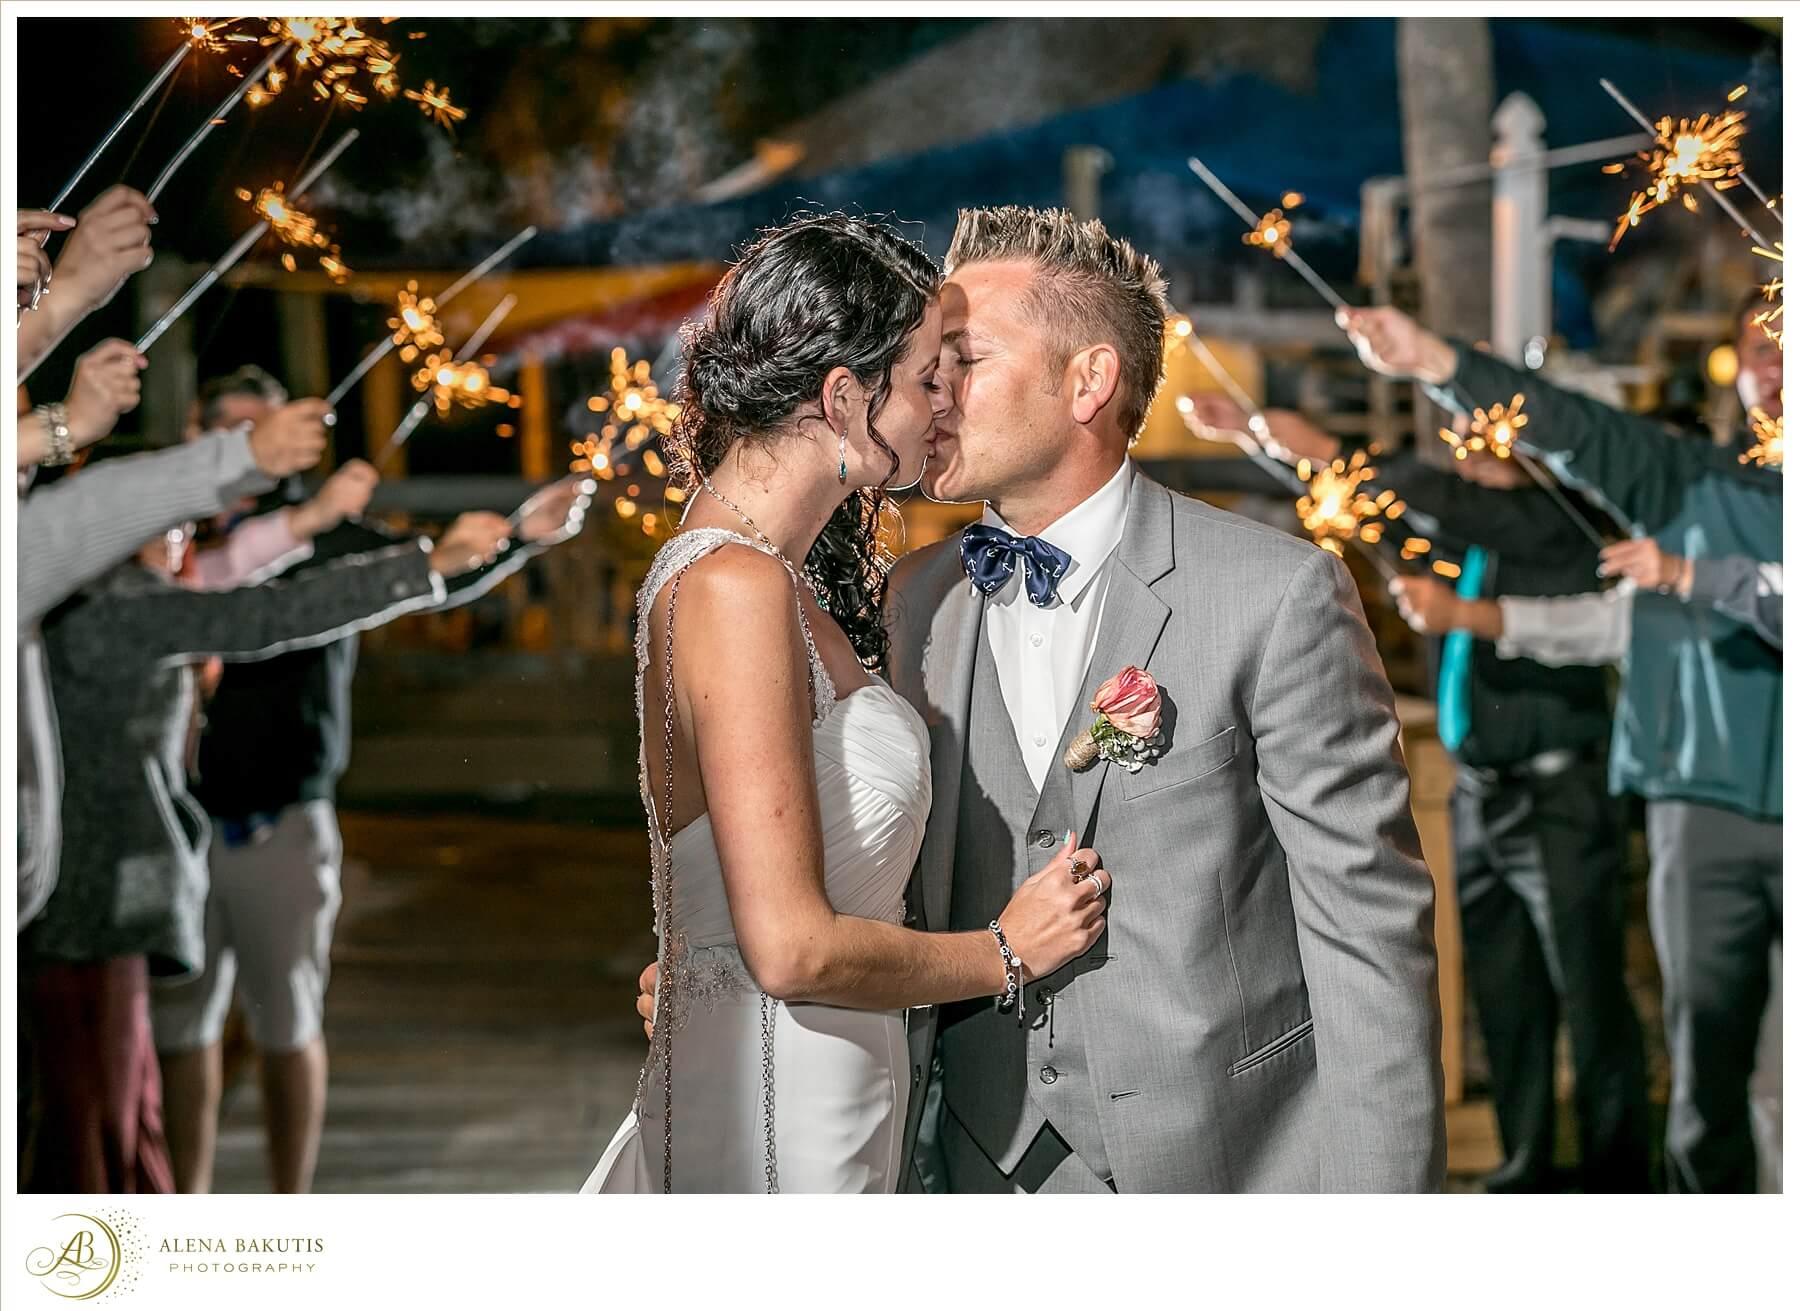 weddings destin Alena Bakutis Photography - Amber Brandon-857_WEB